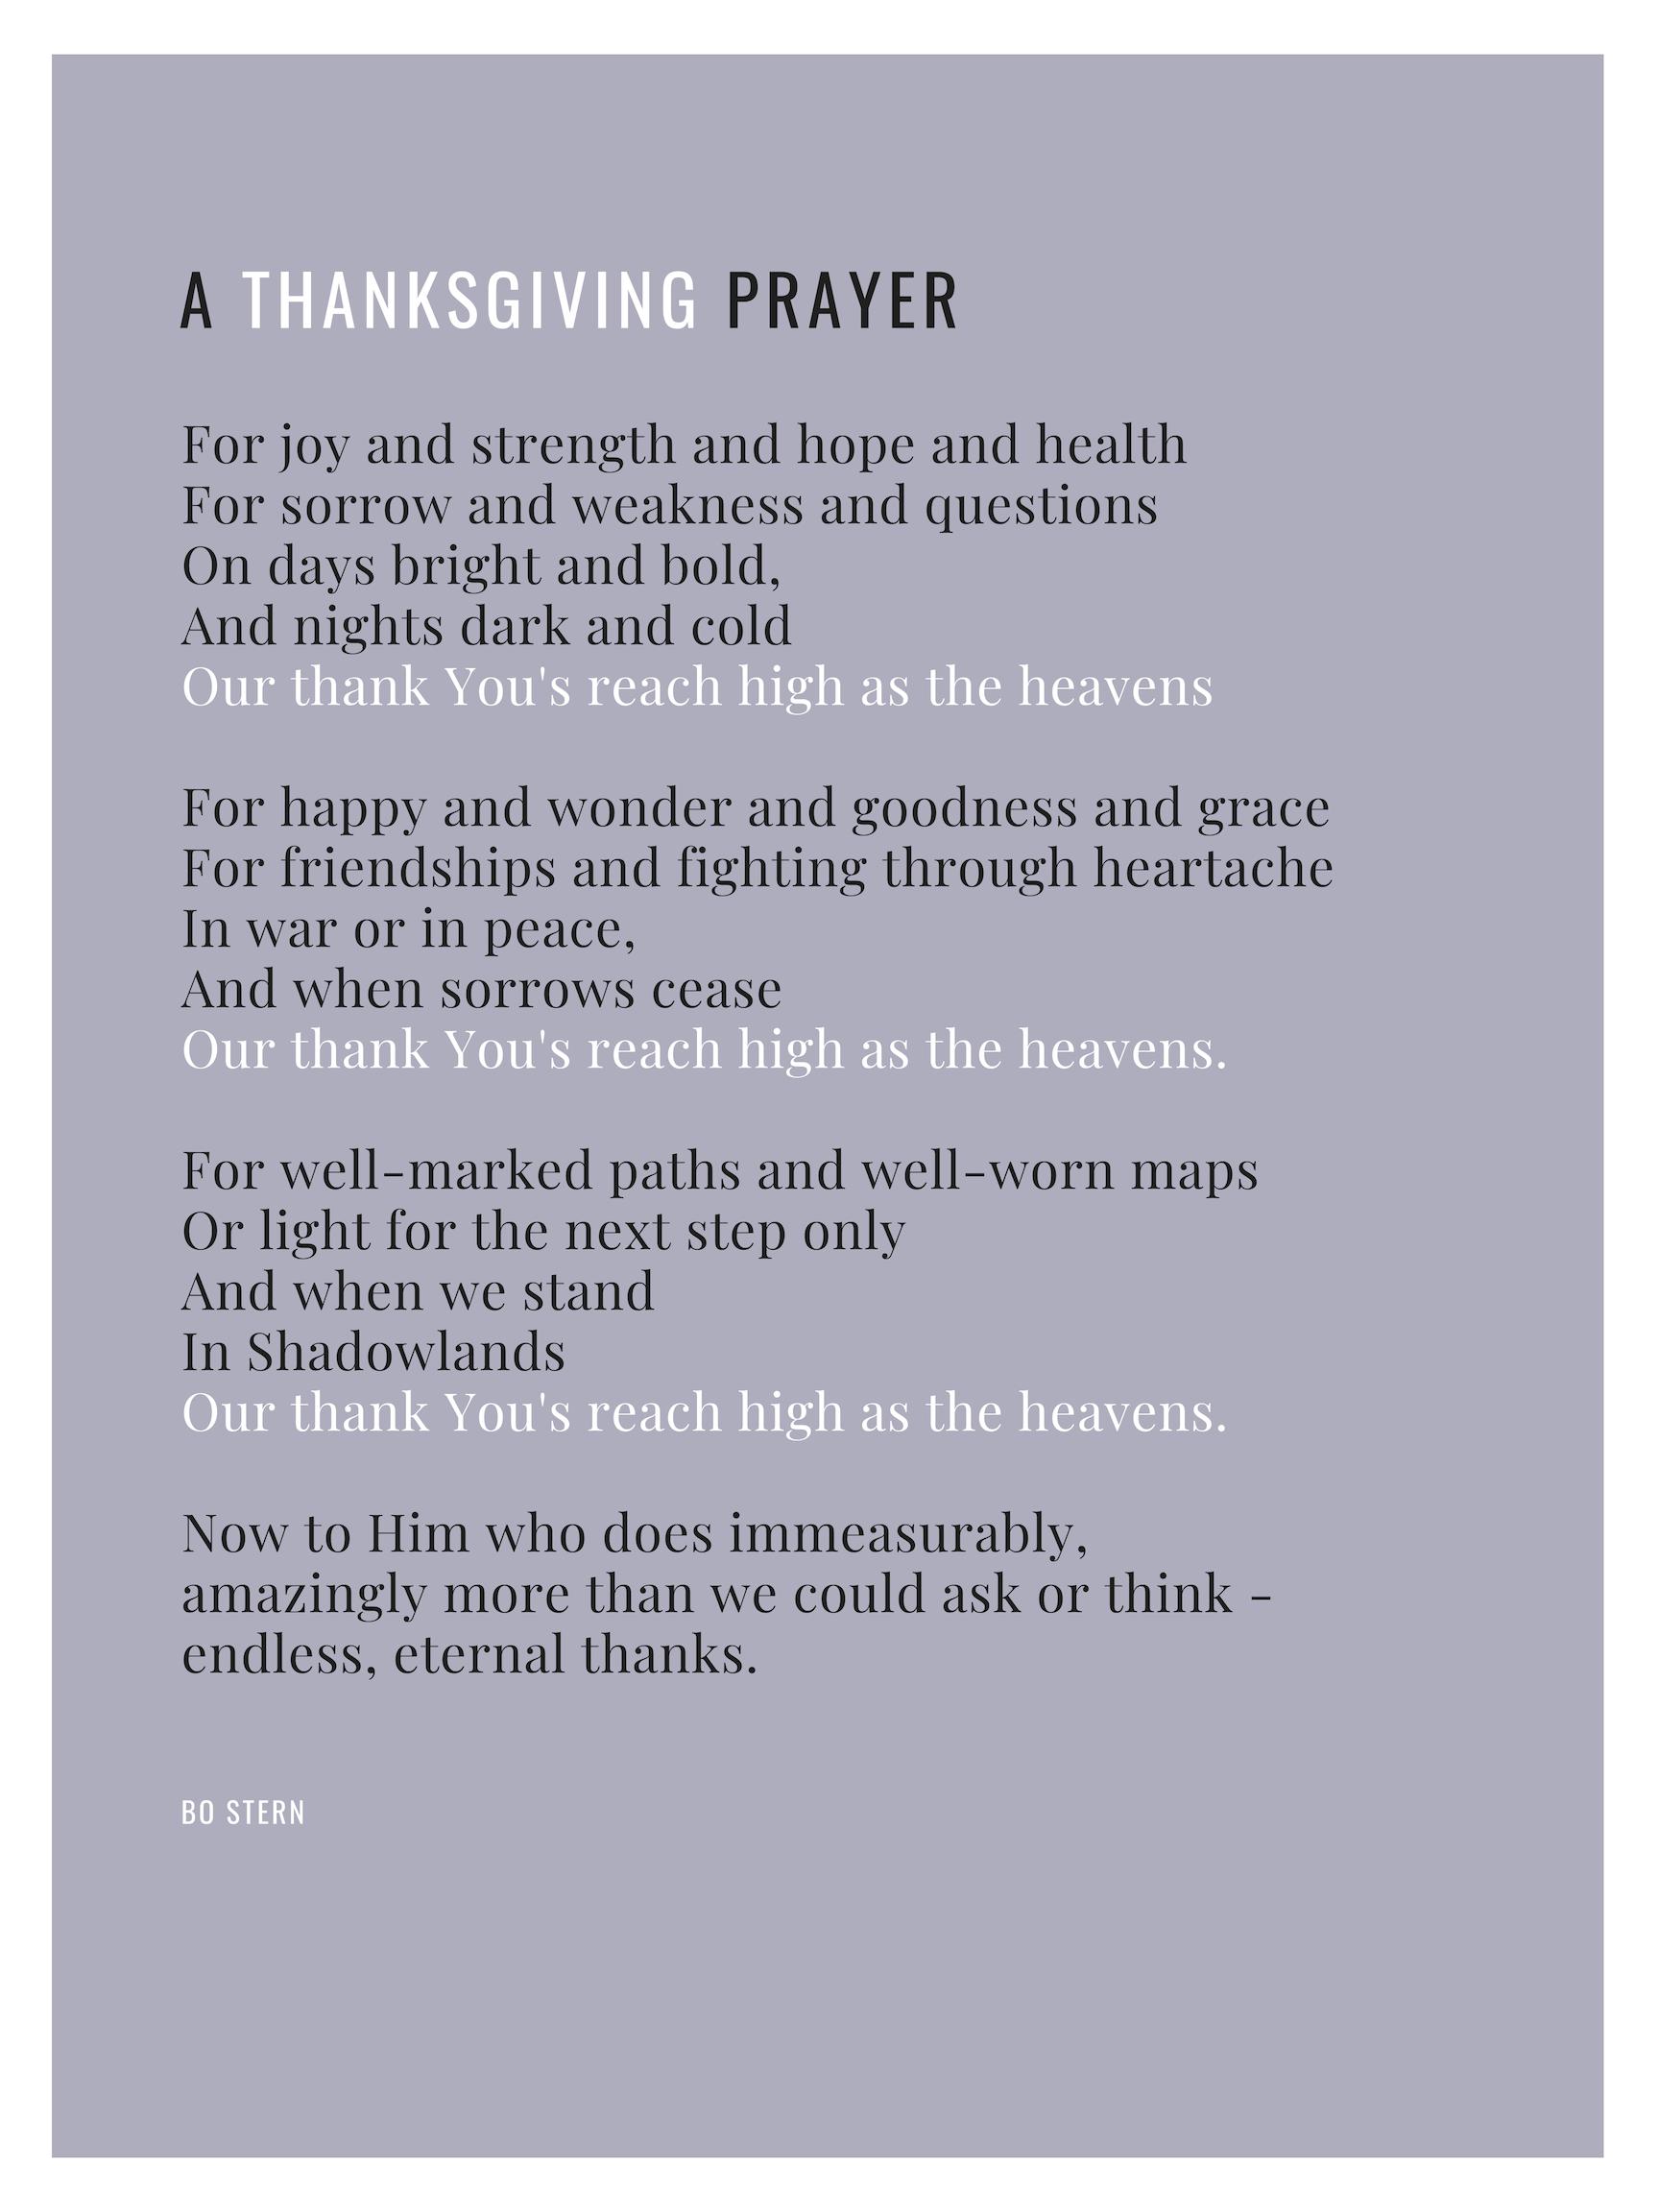 Thanksgiving prayer blue.png